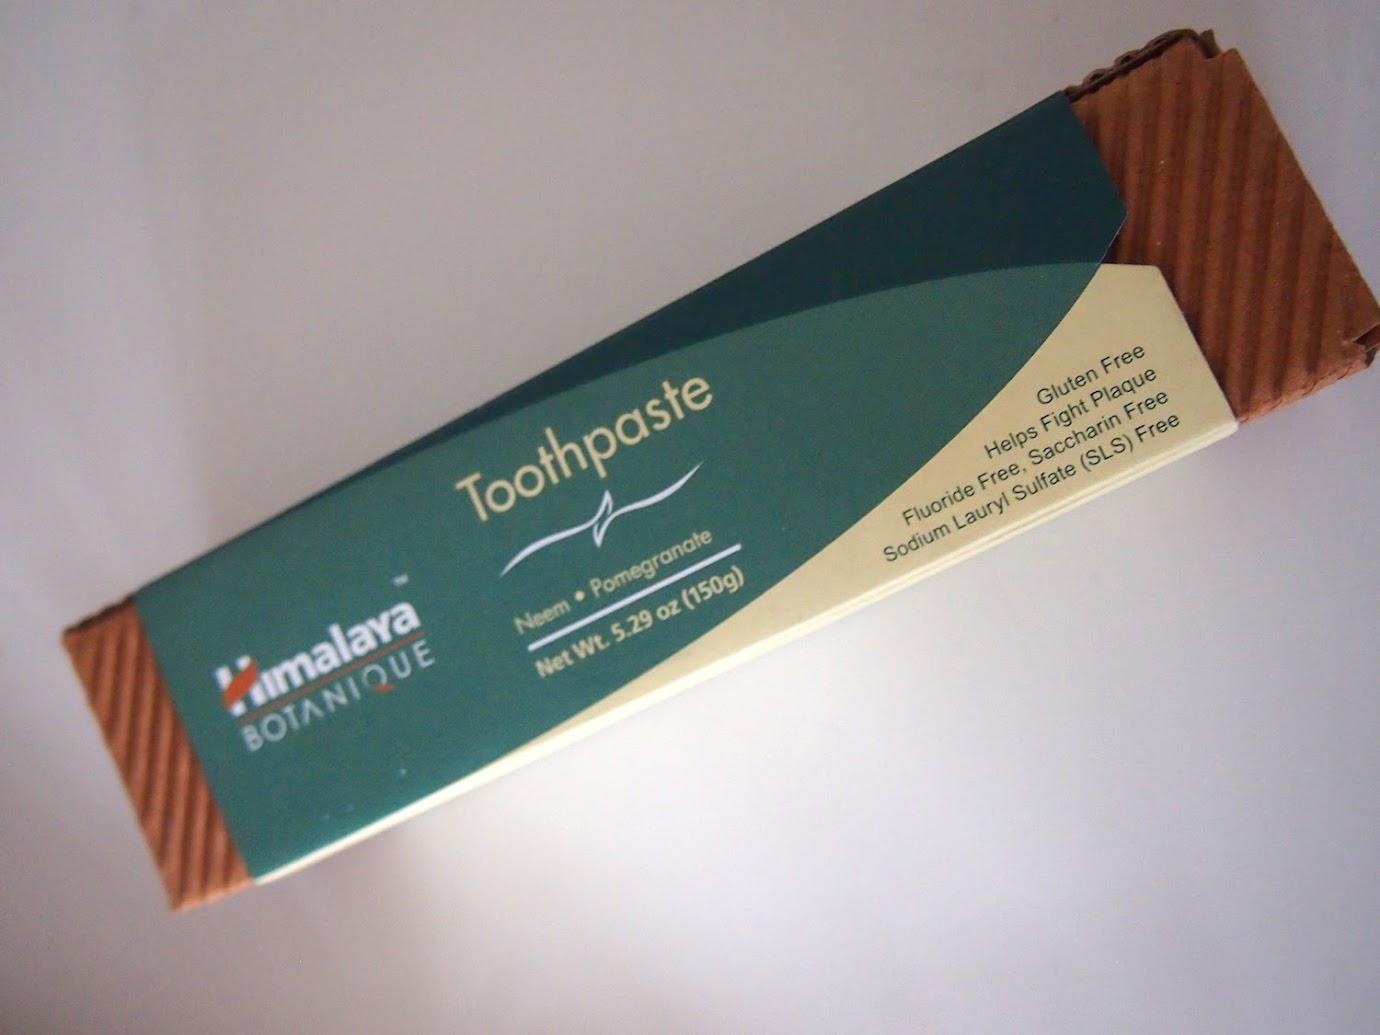 Himalaya Herbal Healthcare, ボタニーク(Botanique), 練り歯磨き, ニーム, ザクロ, フッ化物フリー, 5.29オンス(150 g)